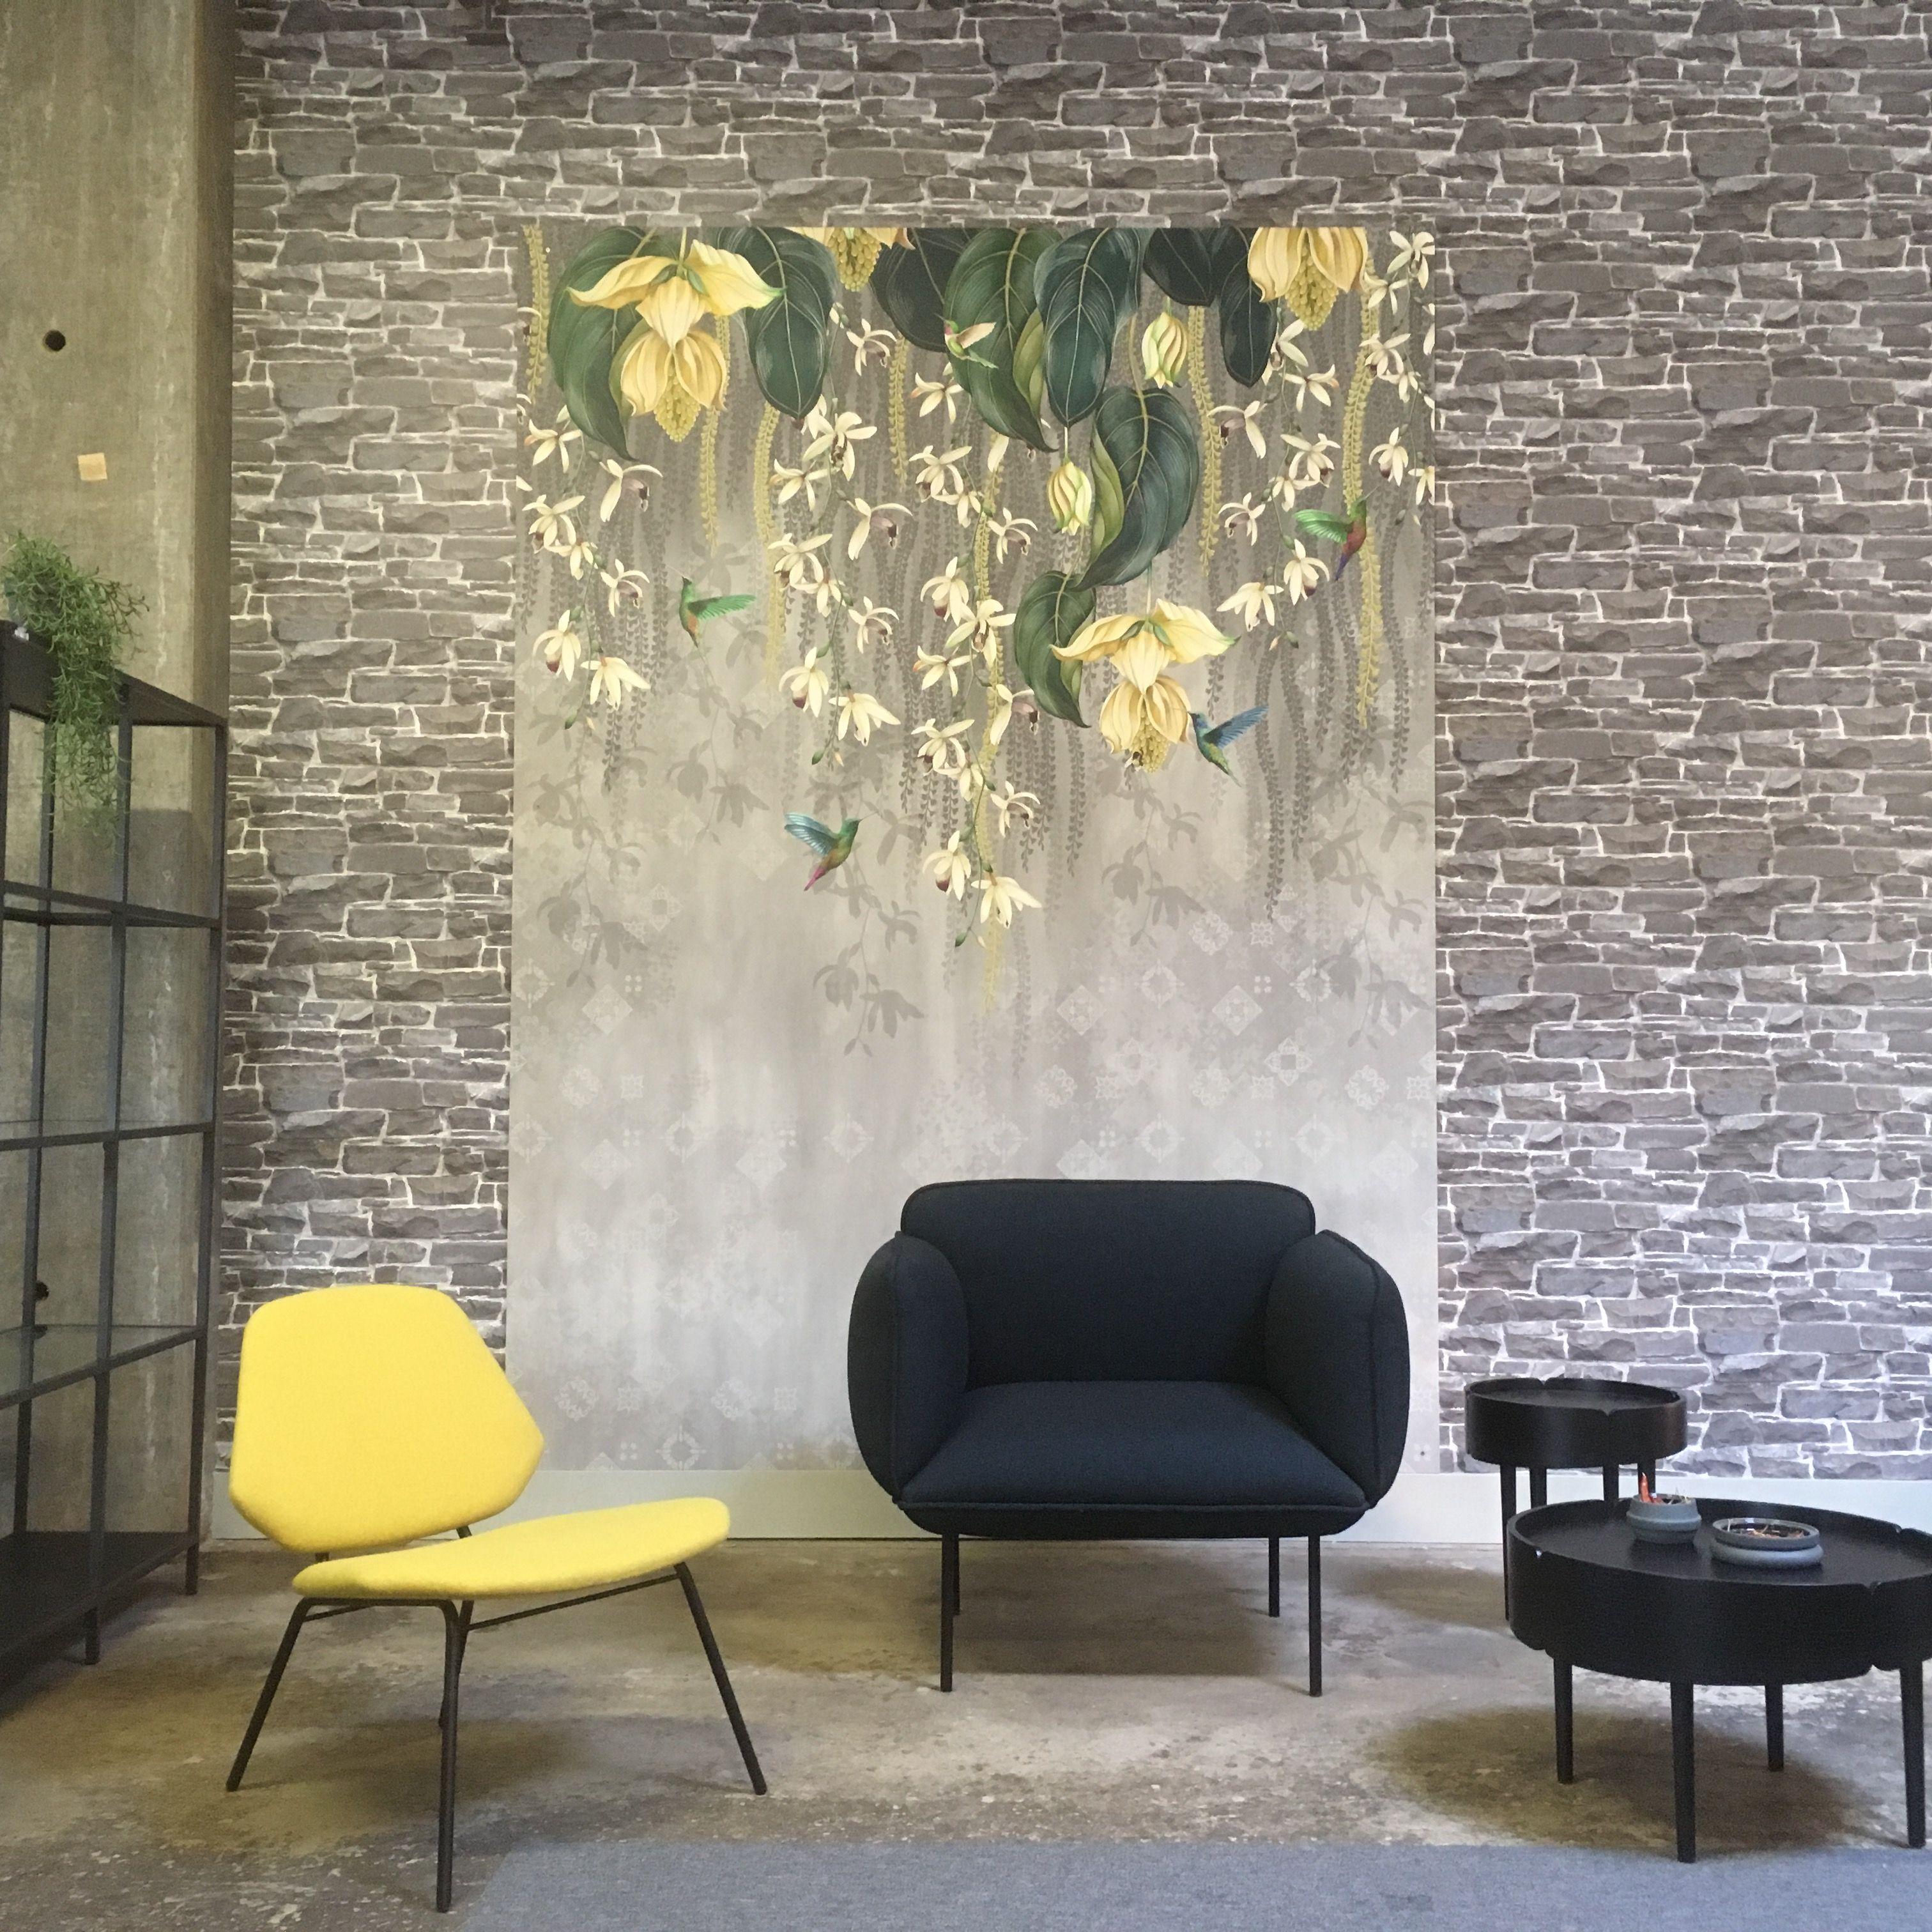 Wallpaper panel by Osborne & Little; Trailing orchid. Woud